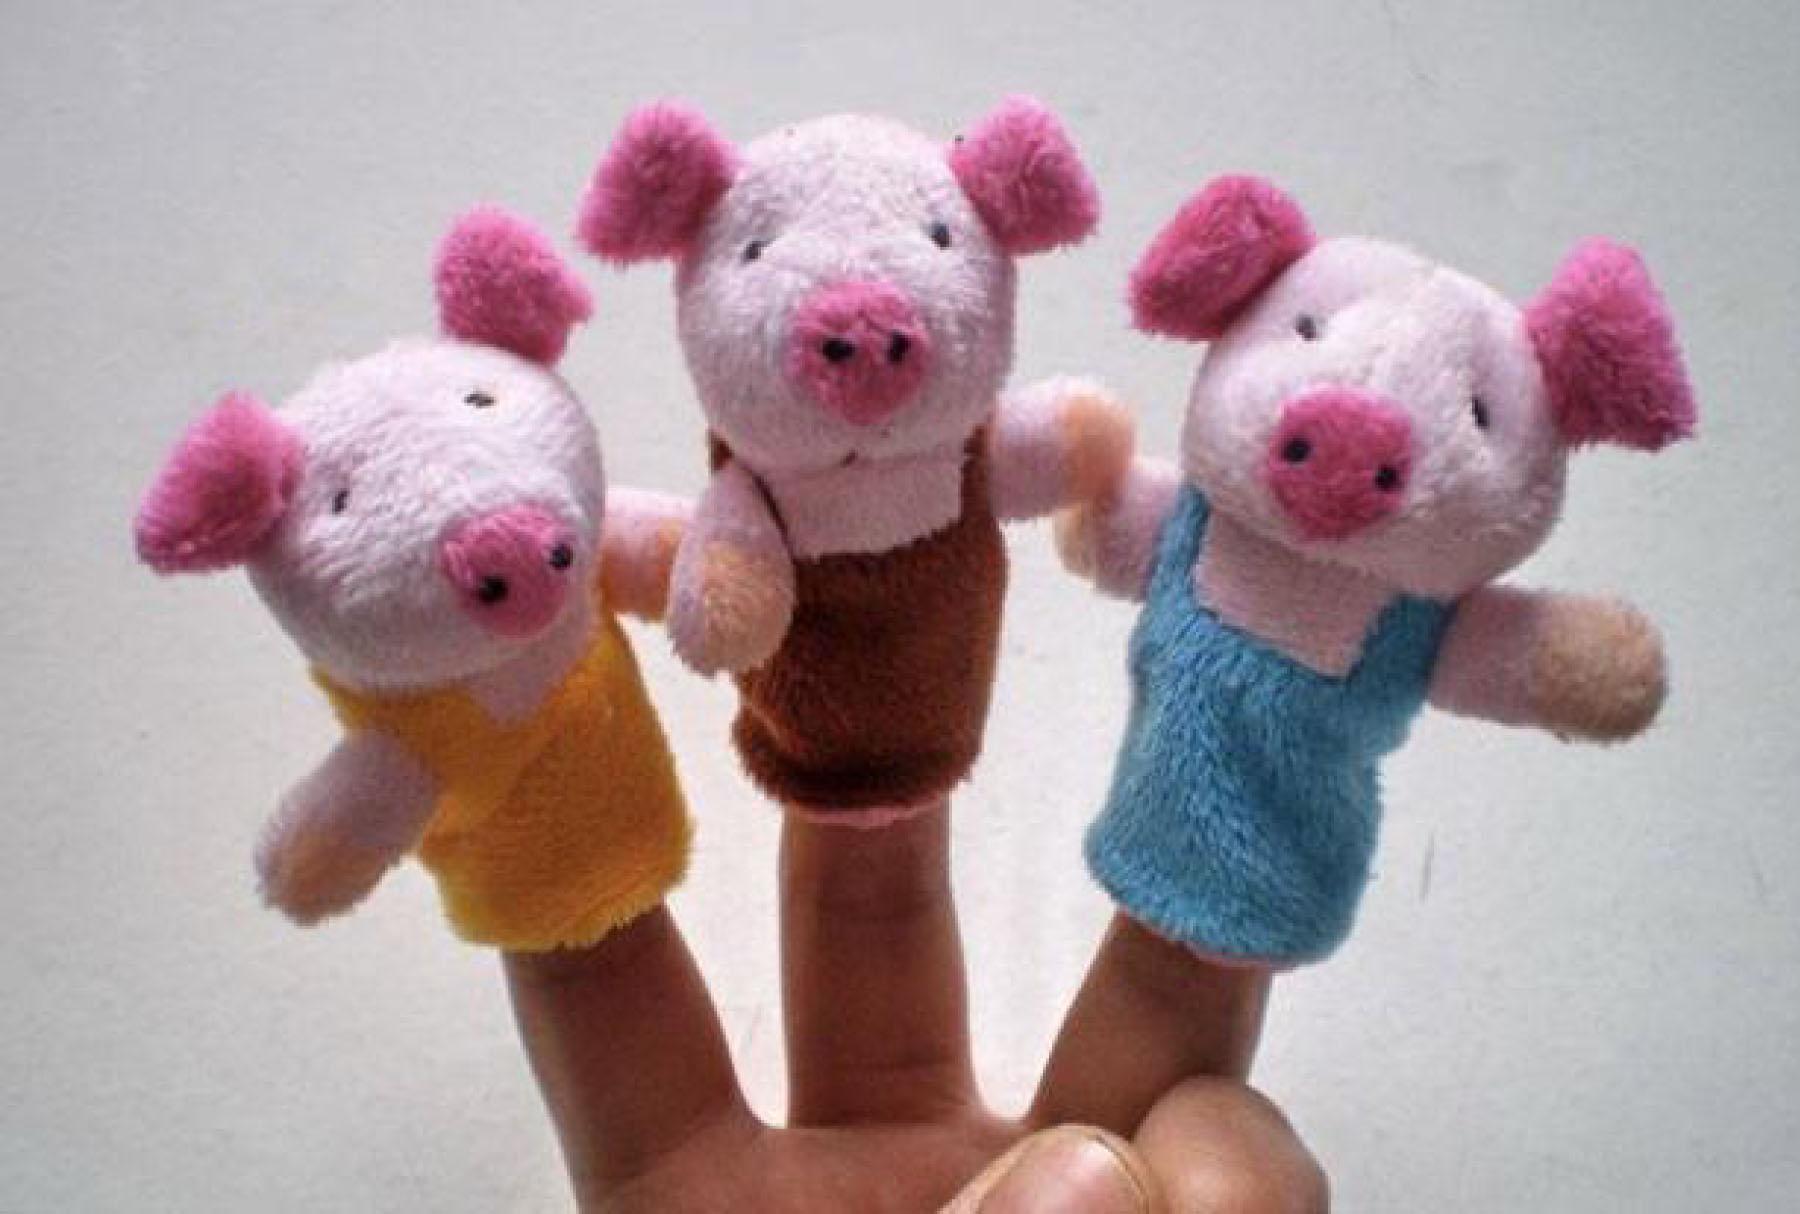 Créditos: http://squoodles.co.nz/products/3-little-pigs-finger-puppets-set-of-8/